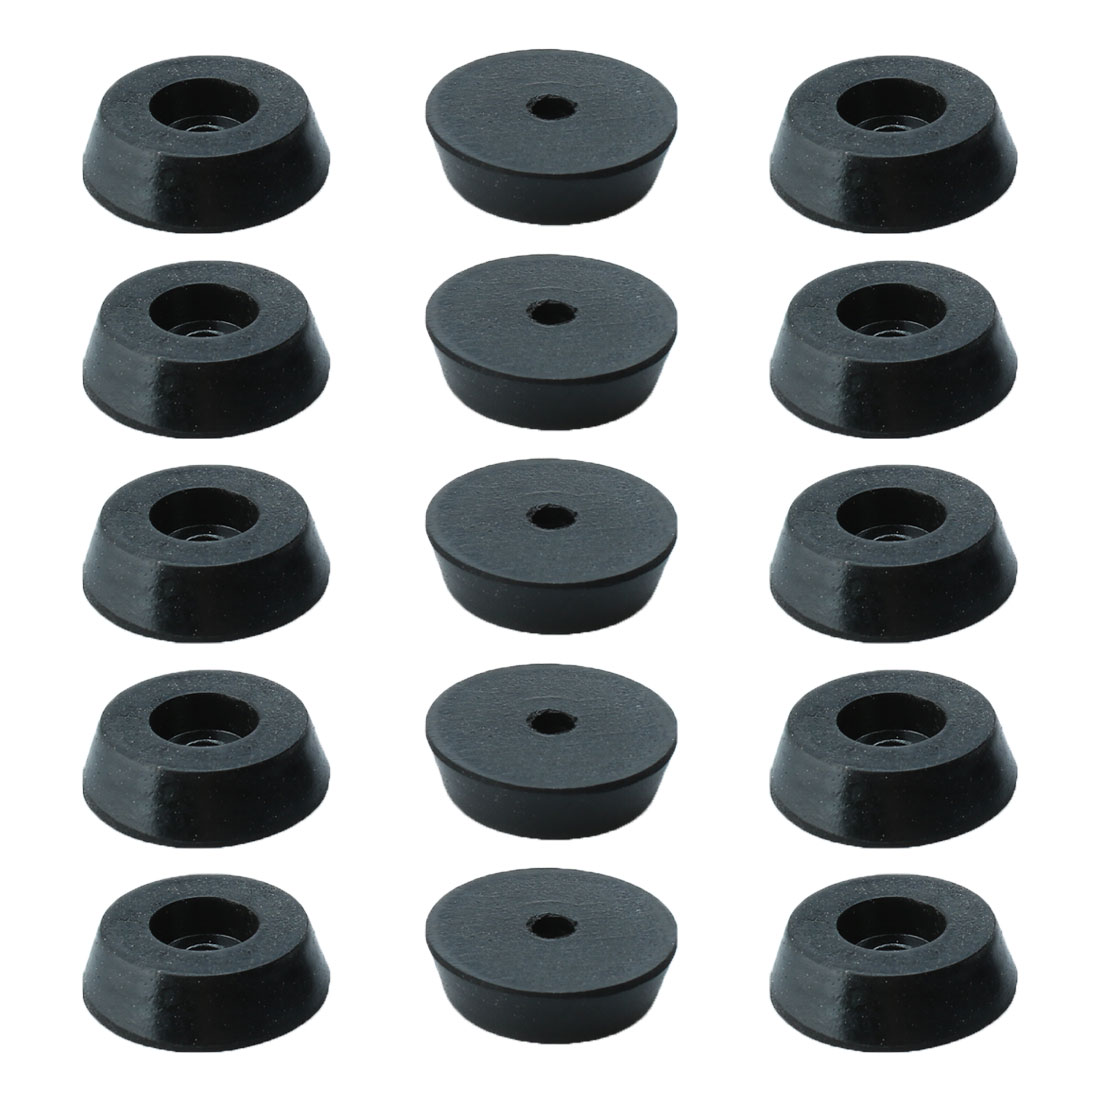 15 Pcs Black Rubber Furniture Desk Foot Pads 18mm Dia